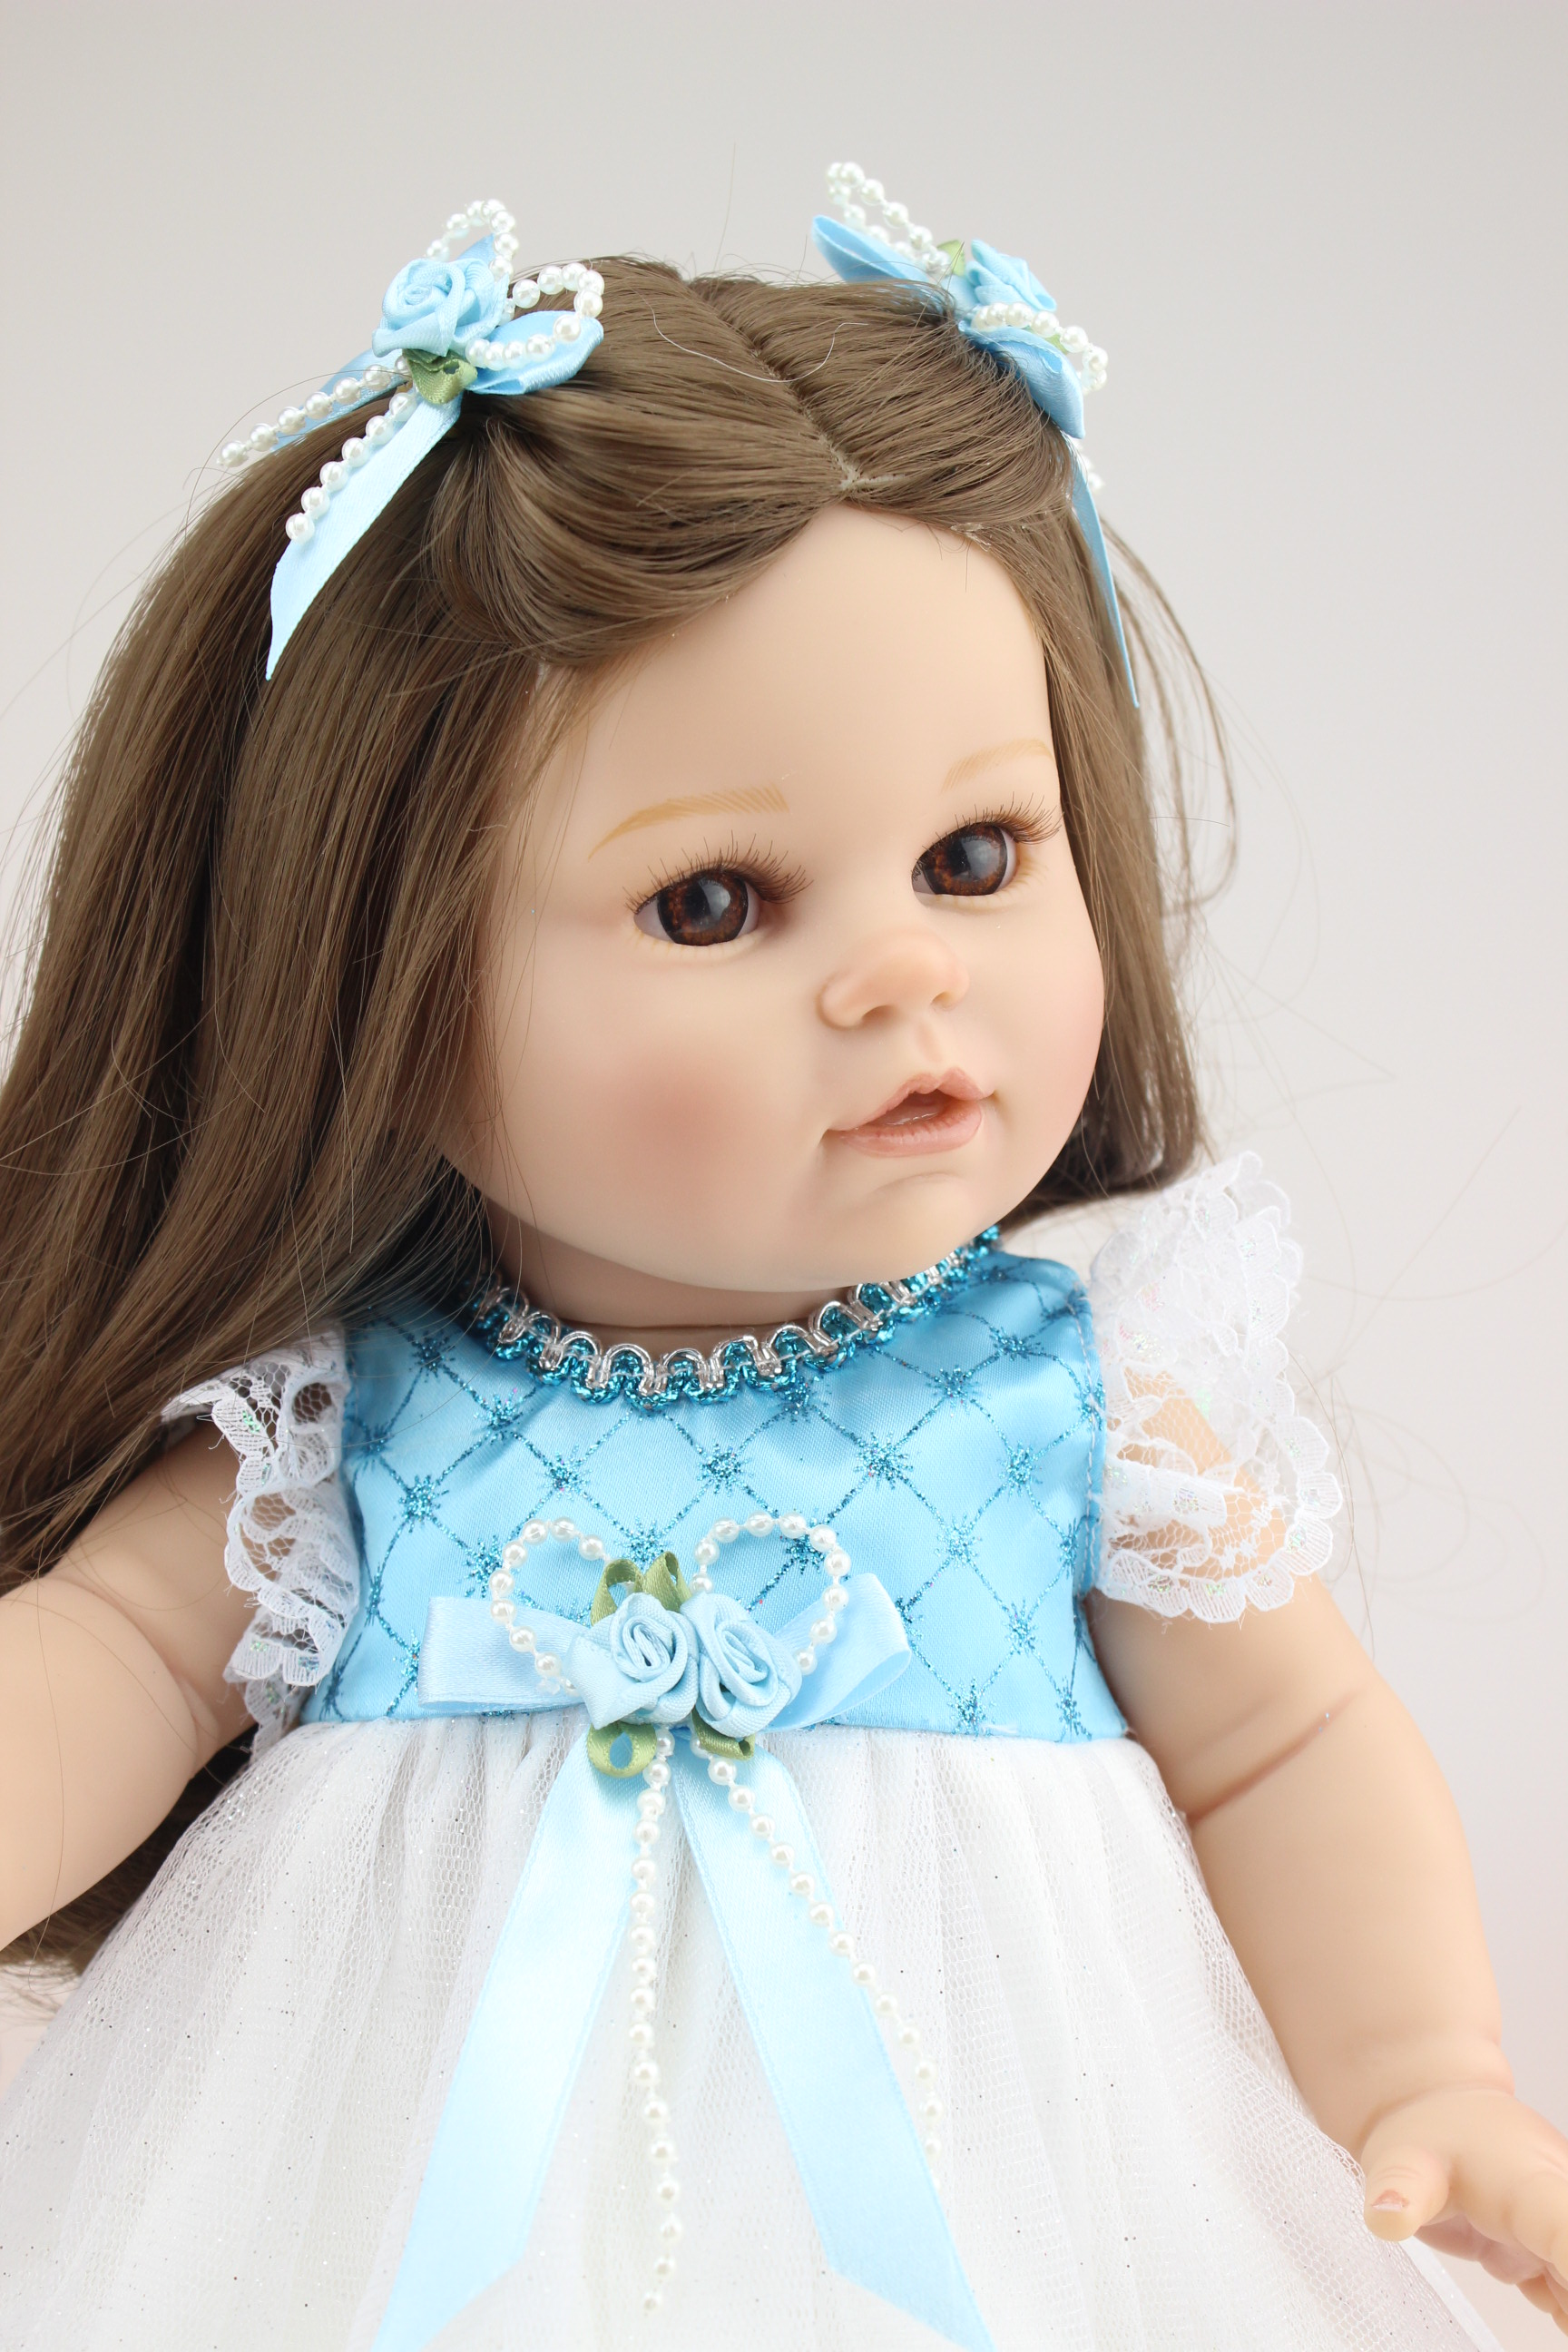 ᐂ\'Reborn Babypuppen Voller Handgemachte Neugeborenen Puppe Baby ...